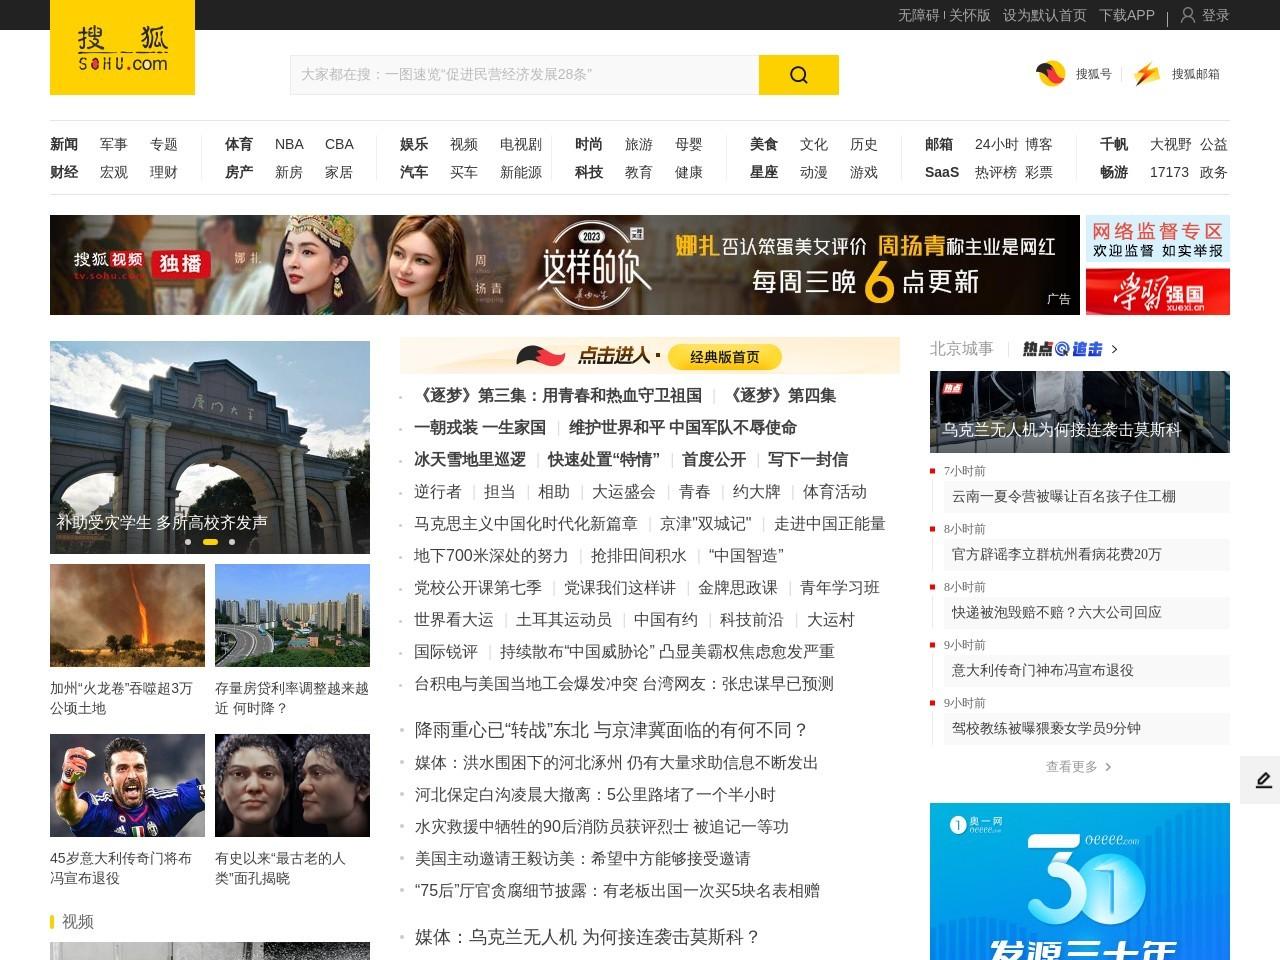 CBA允许观众入场观战 京粤大战球迷现场助阵(图)-搜狐大视野-搜狐新闻